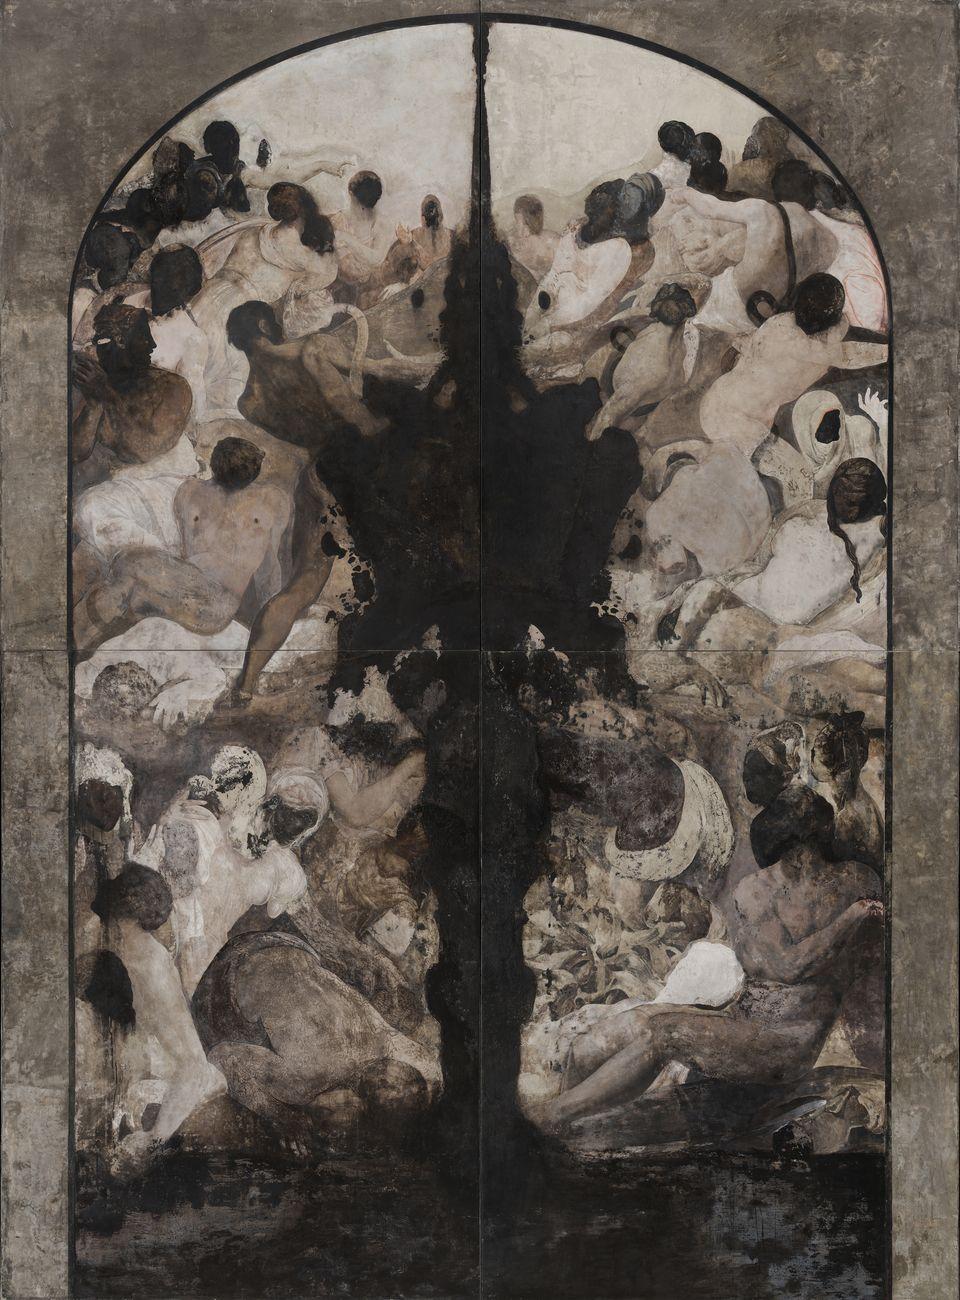 Nicola Samorì, Valle Umana (Malafonte), 2018. Courtesy Galerie EIGEN + ART, Lipsia Berlino